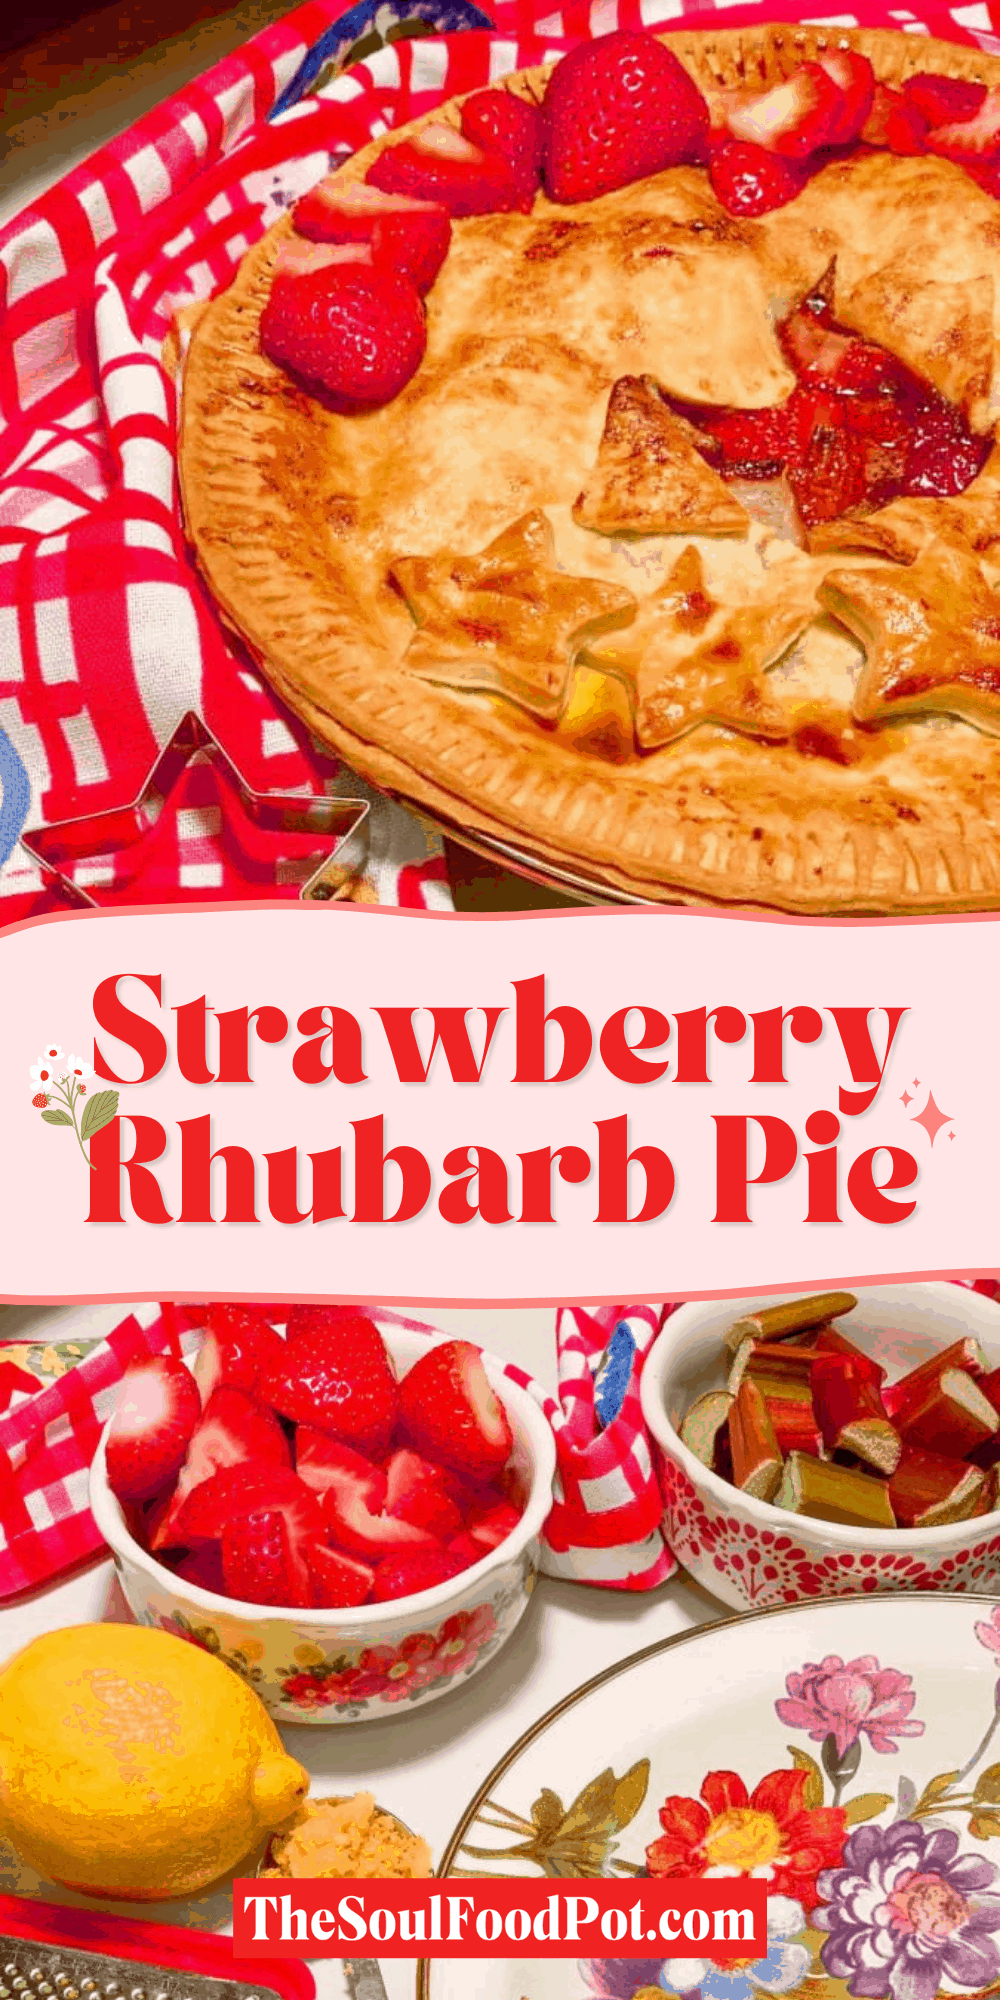 Easy Strawberry Rhubarb Pie Recipe - Instant Pot Omni Plus Oven